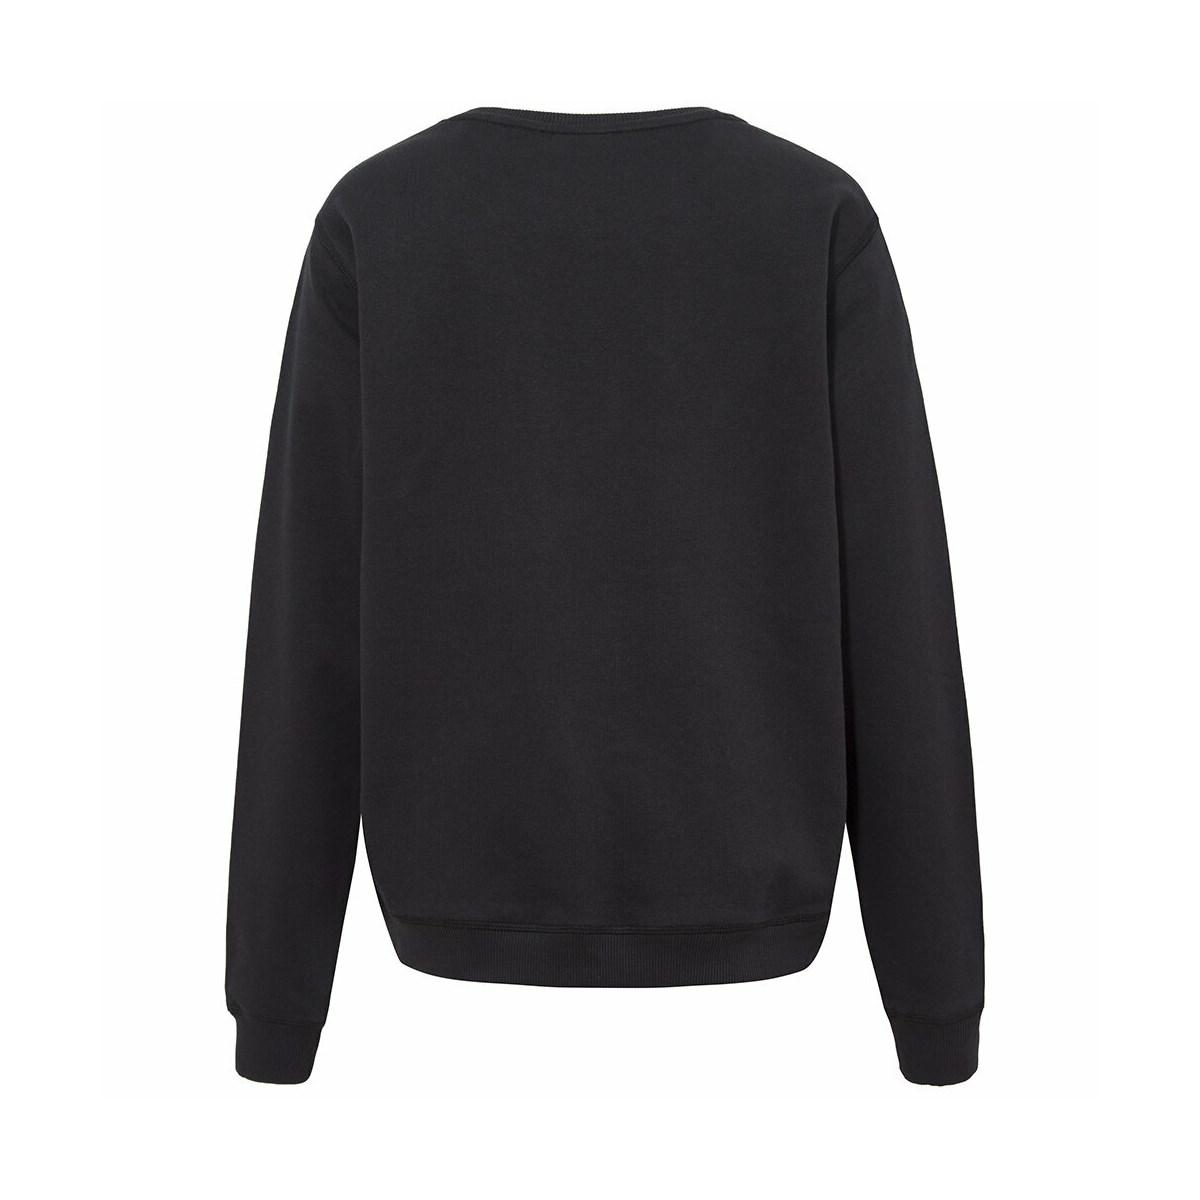 Csc W Bugasweat Kadın Siyah Sweatshirt